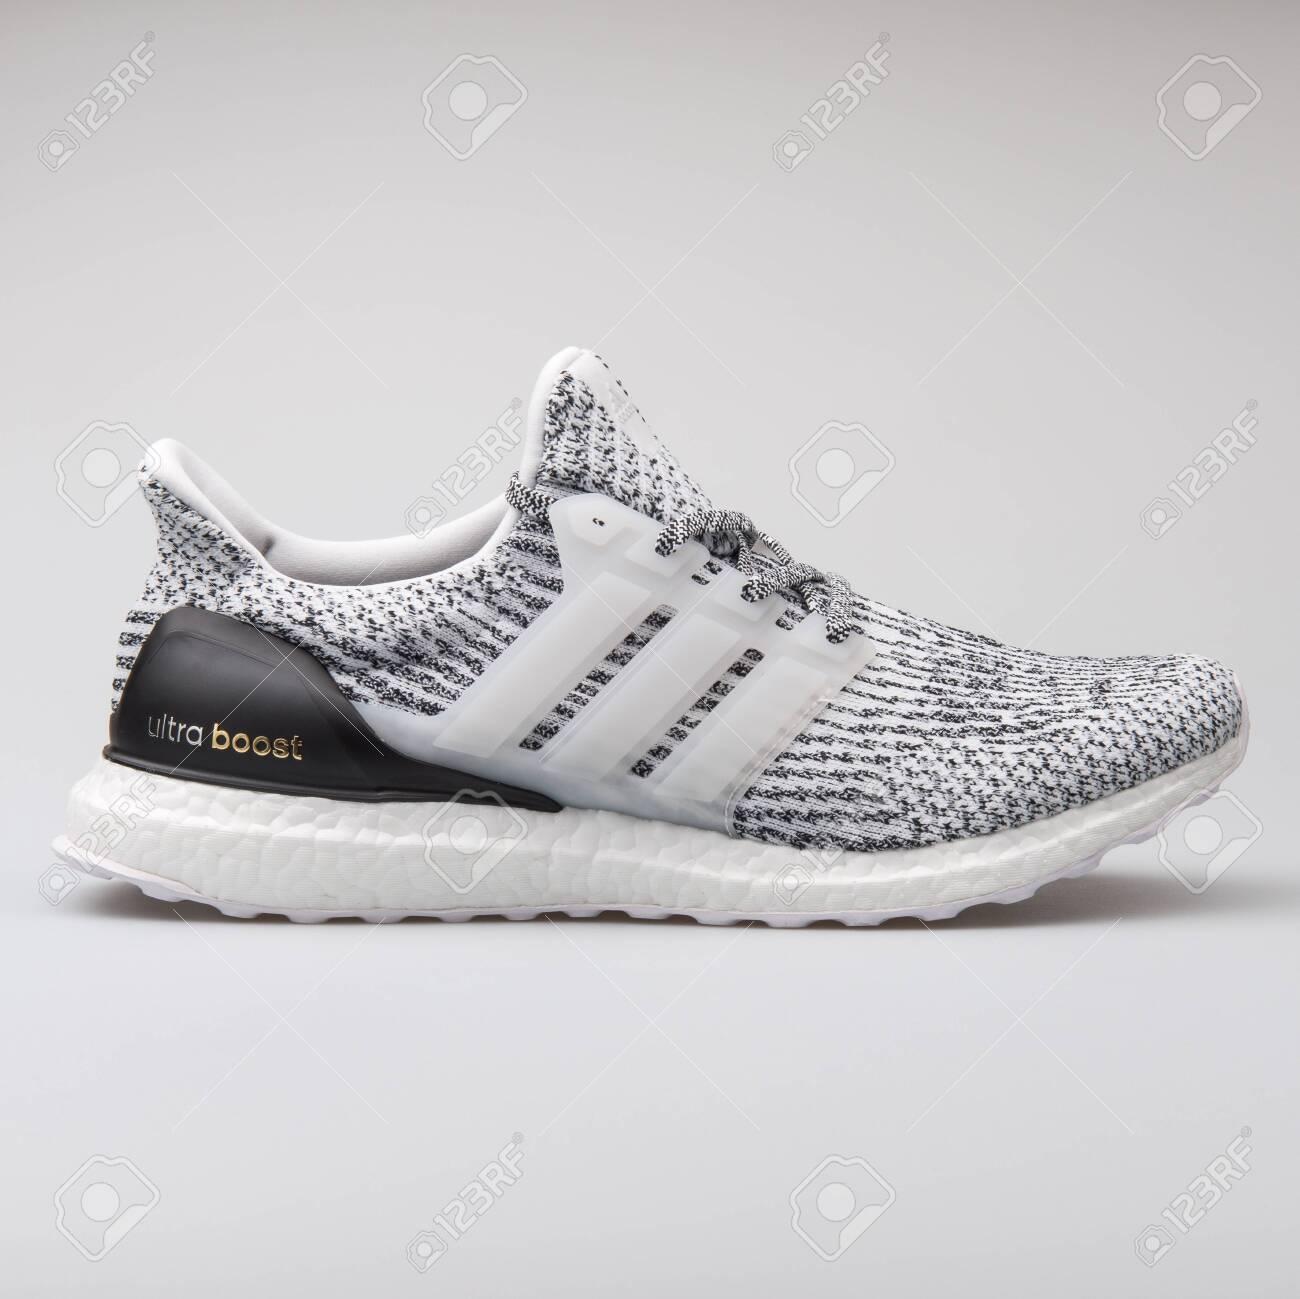 nouveaux styles 4c34c c0ed2 VIENNA, AUSTRIA - AUGUST 7, 2017: Adidas Ultraboost white and..